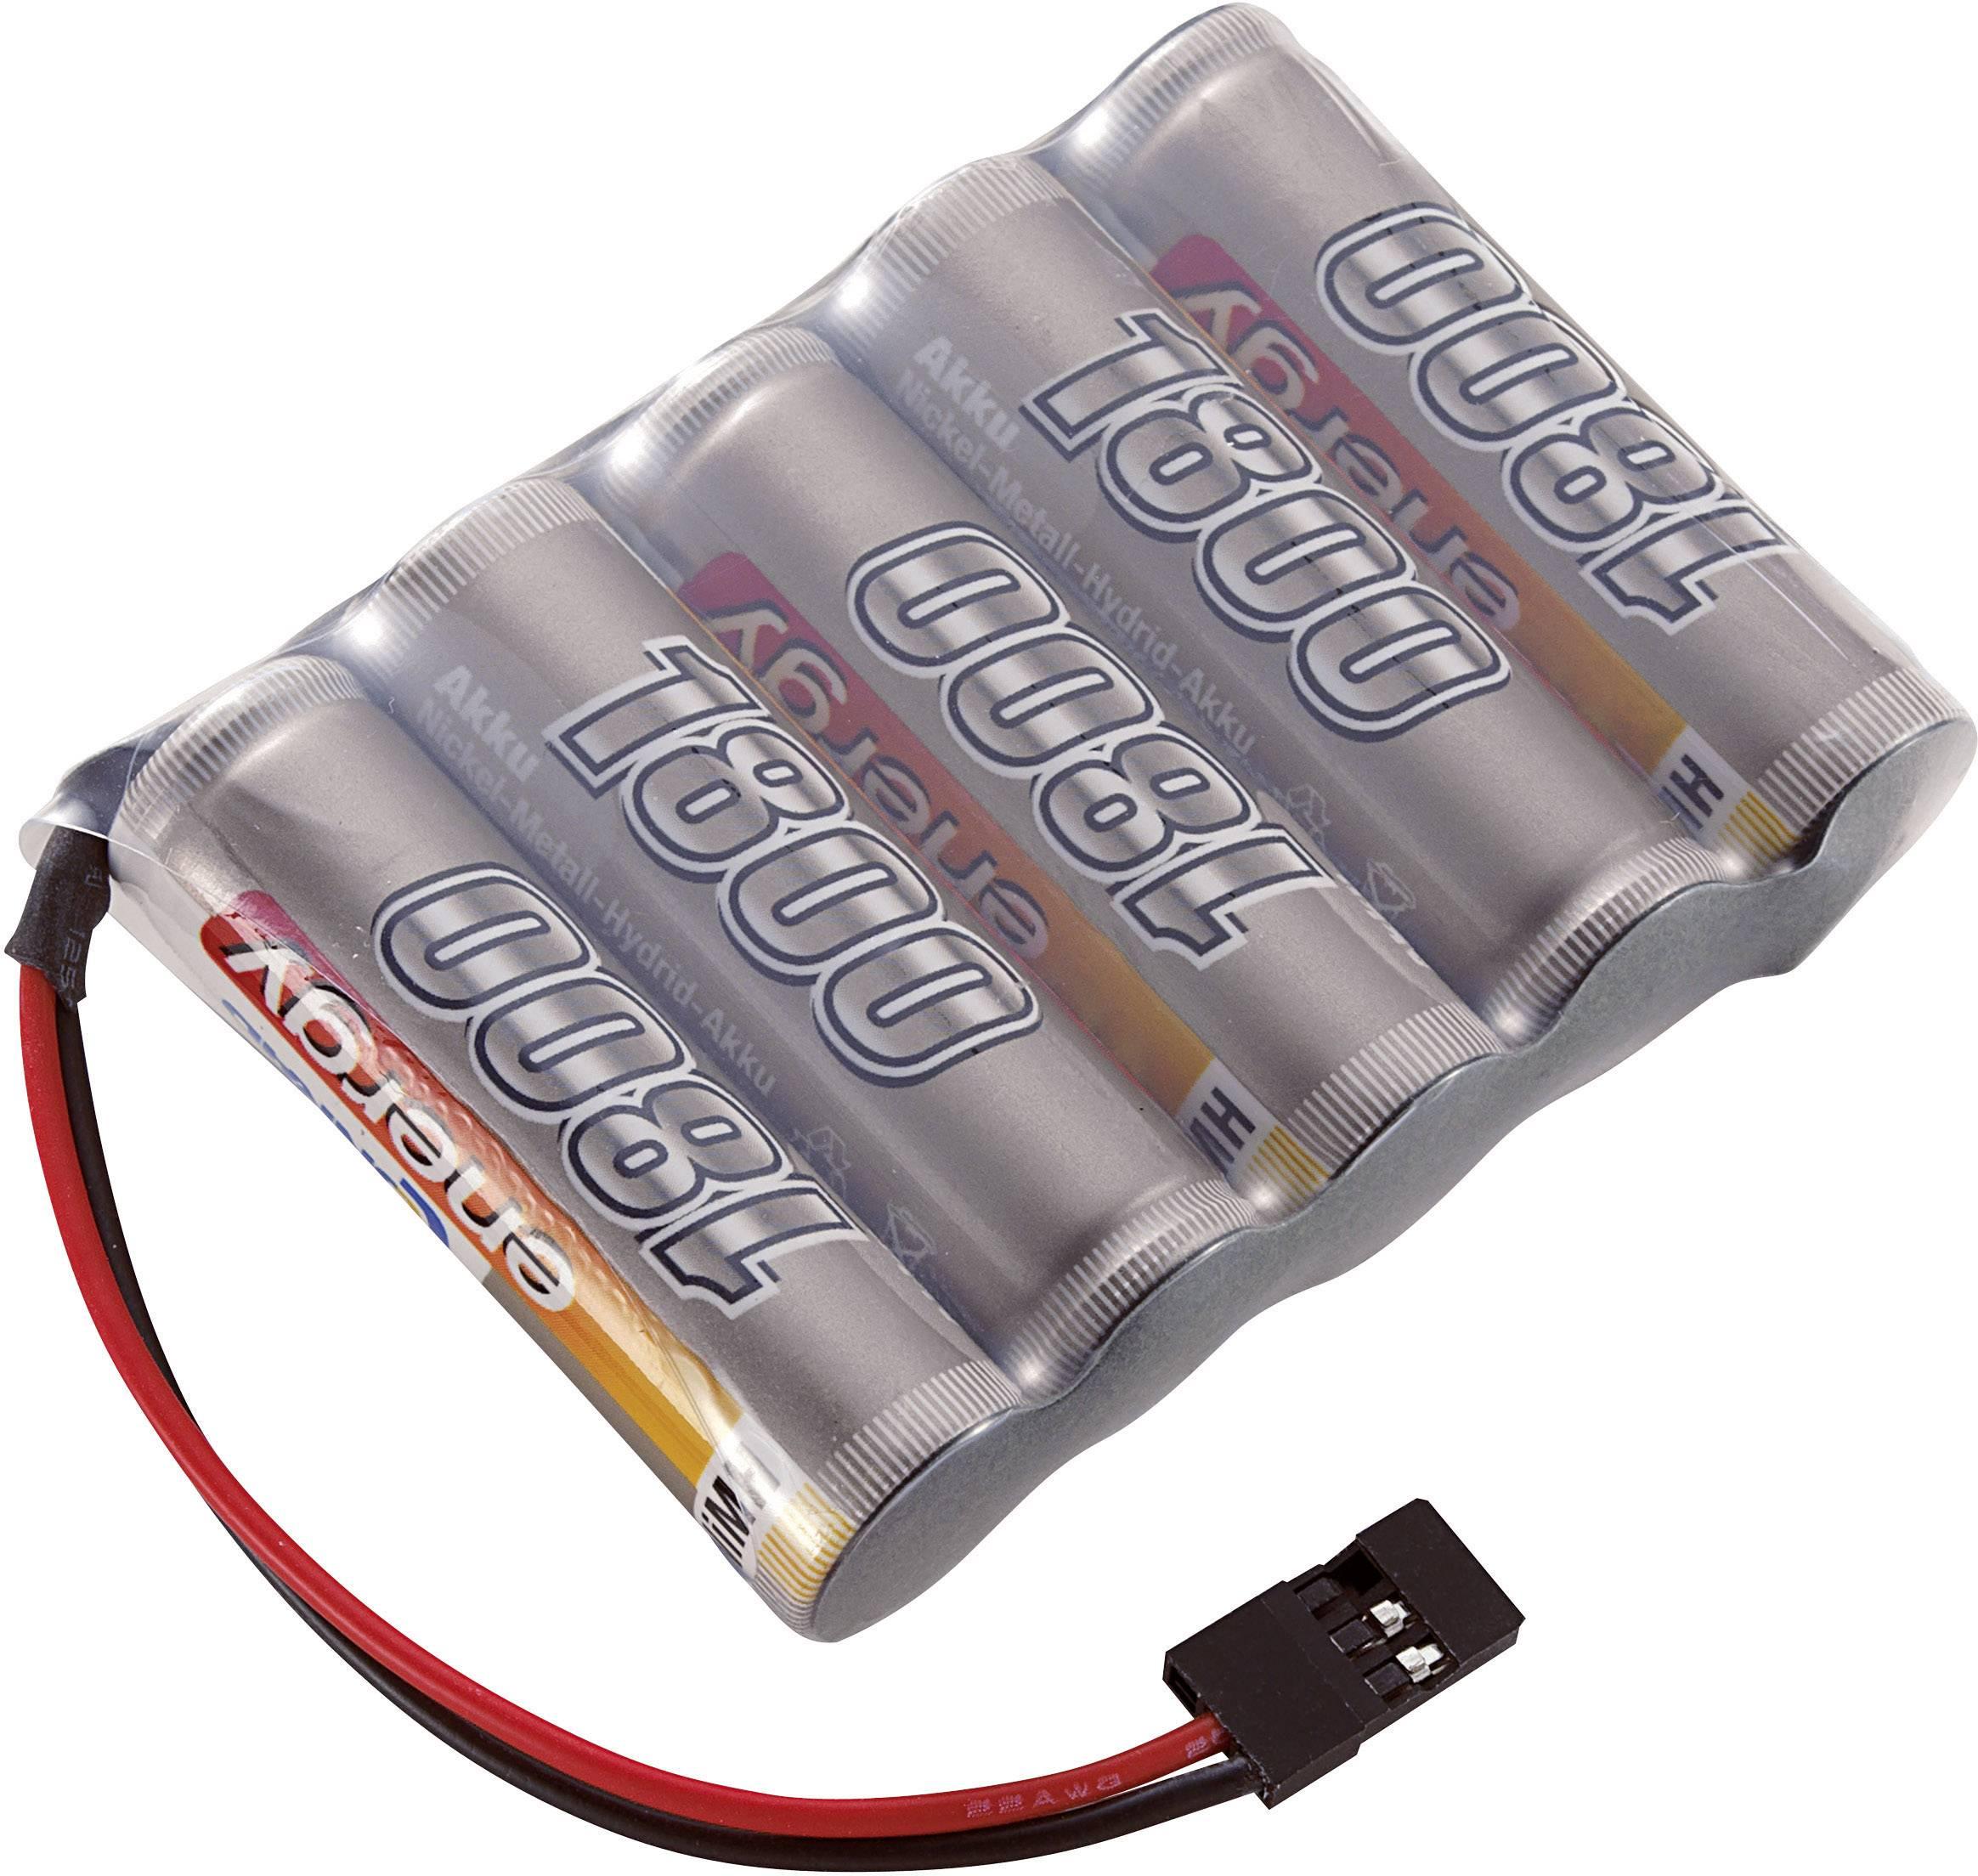 Akupack přijímače NiMH Conrad Energy AA, 6 V, 1800 mAh, Side by Side, JR